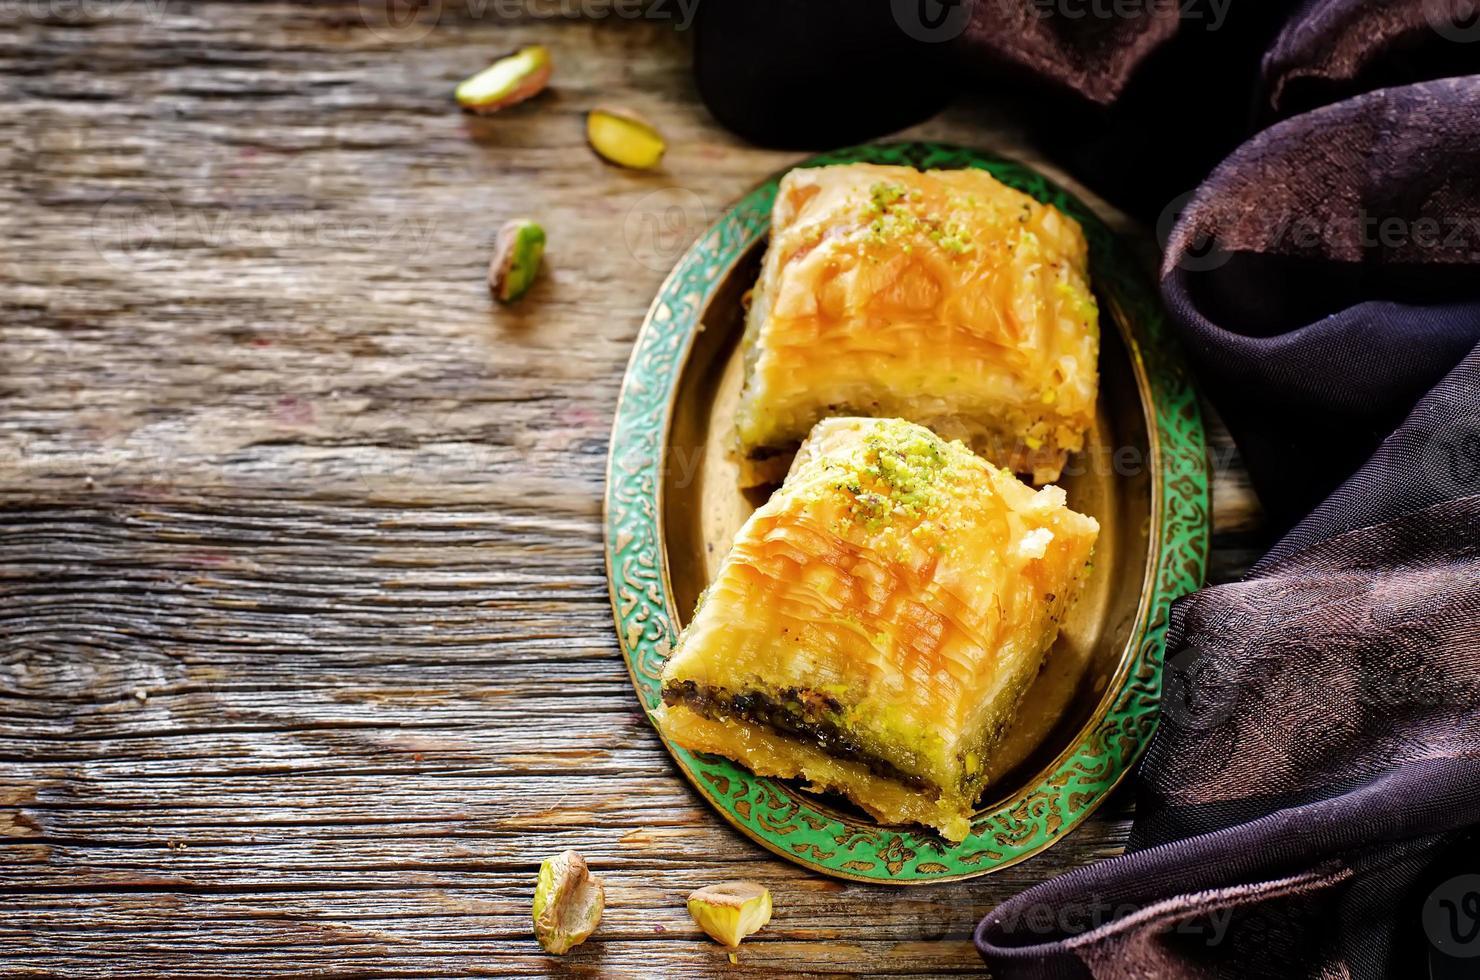 baklava con pistacho. delicia tradicional turca foto